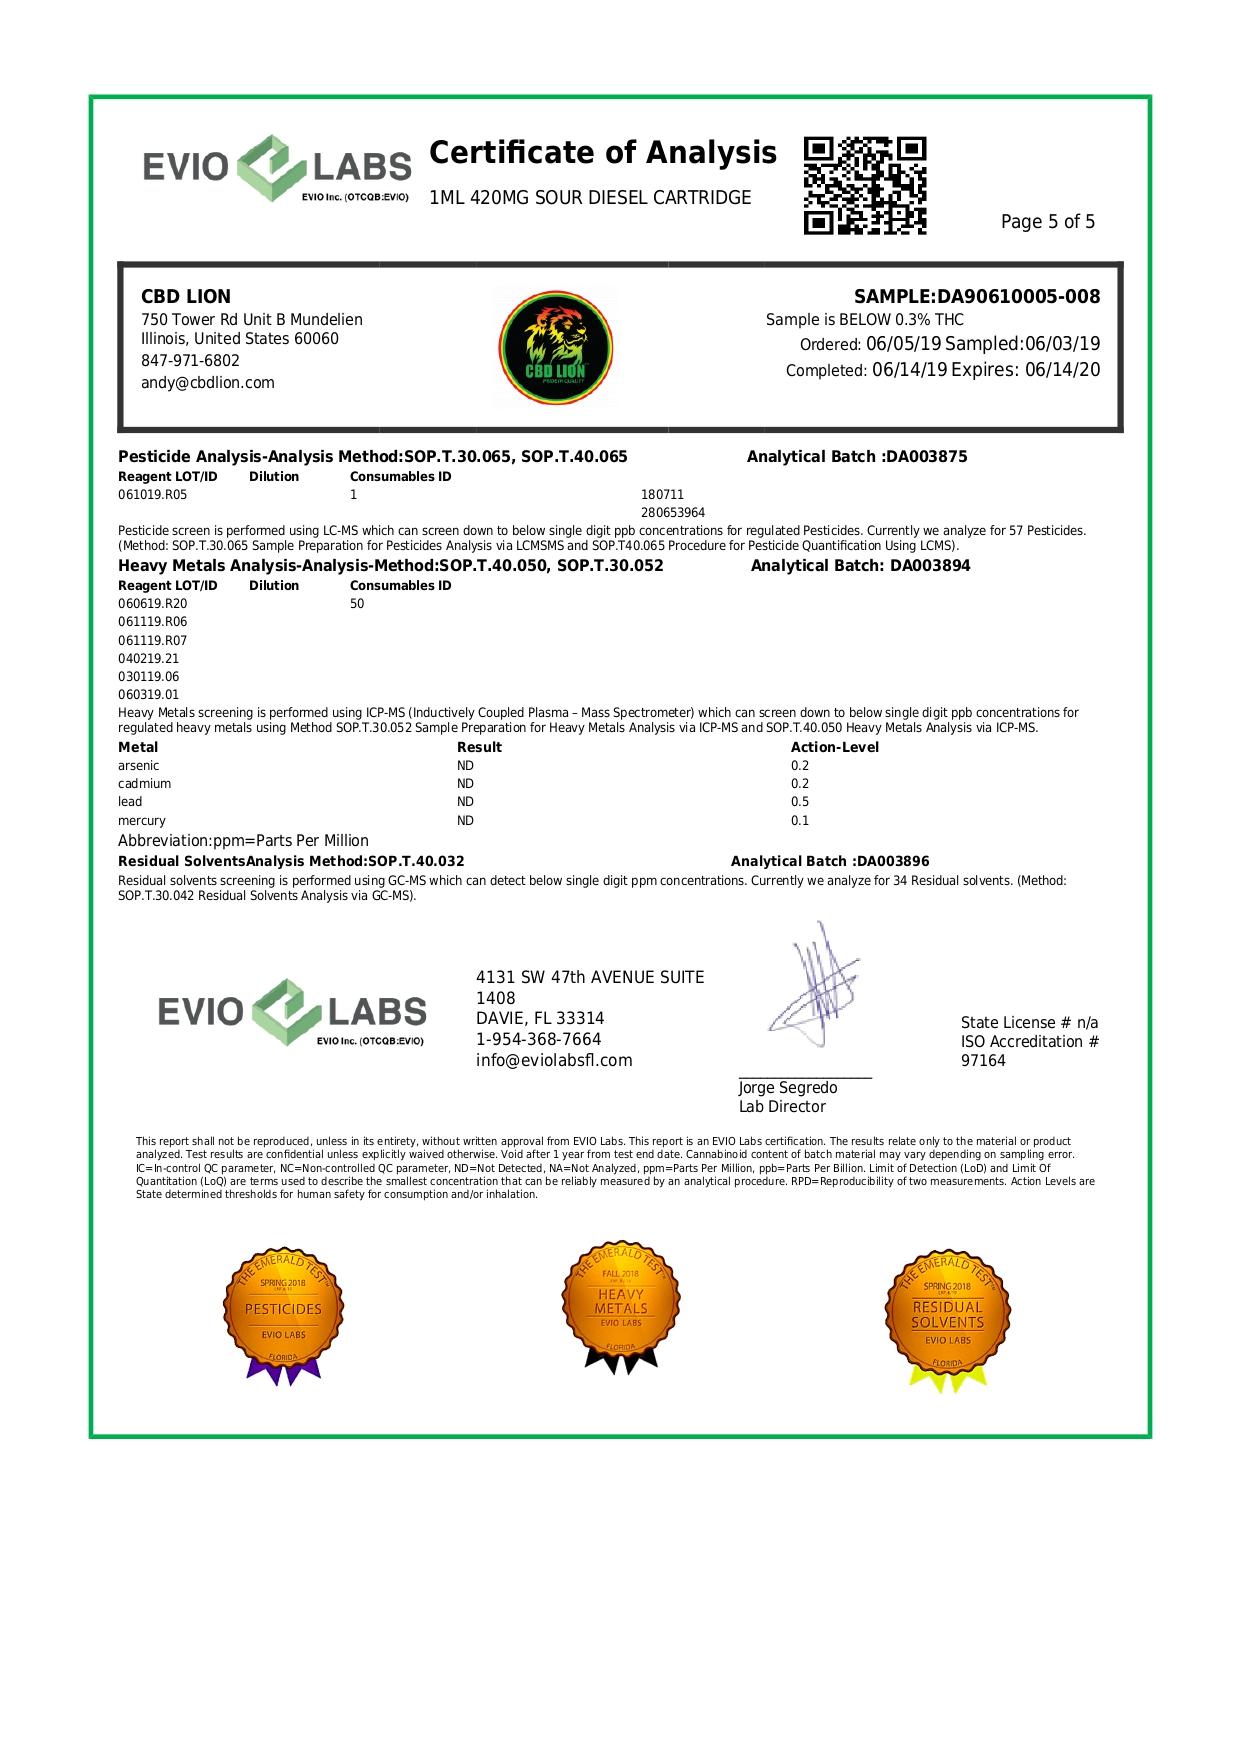 CBD Lion CBD Cartridge Sour Diesel 420mg Lab Report